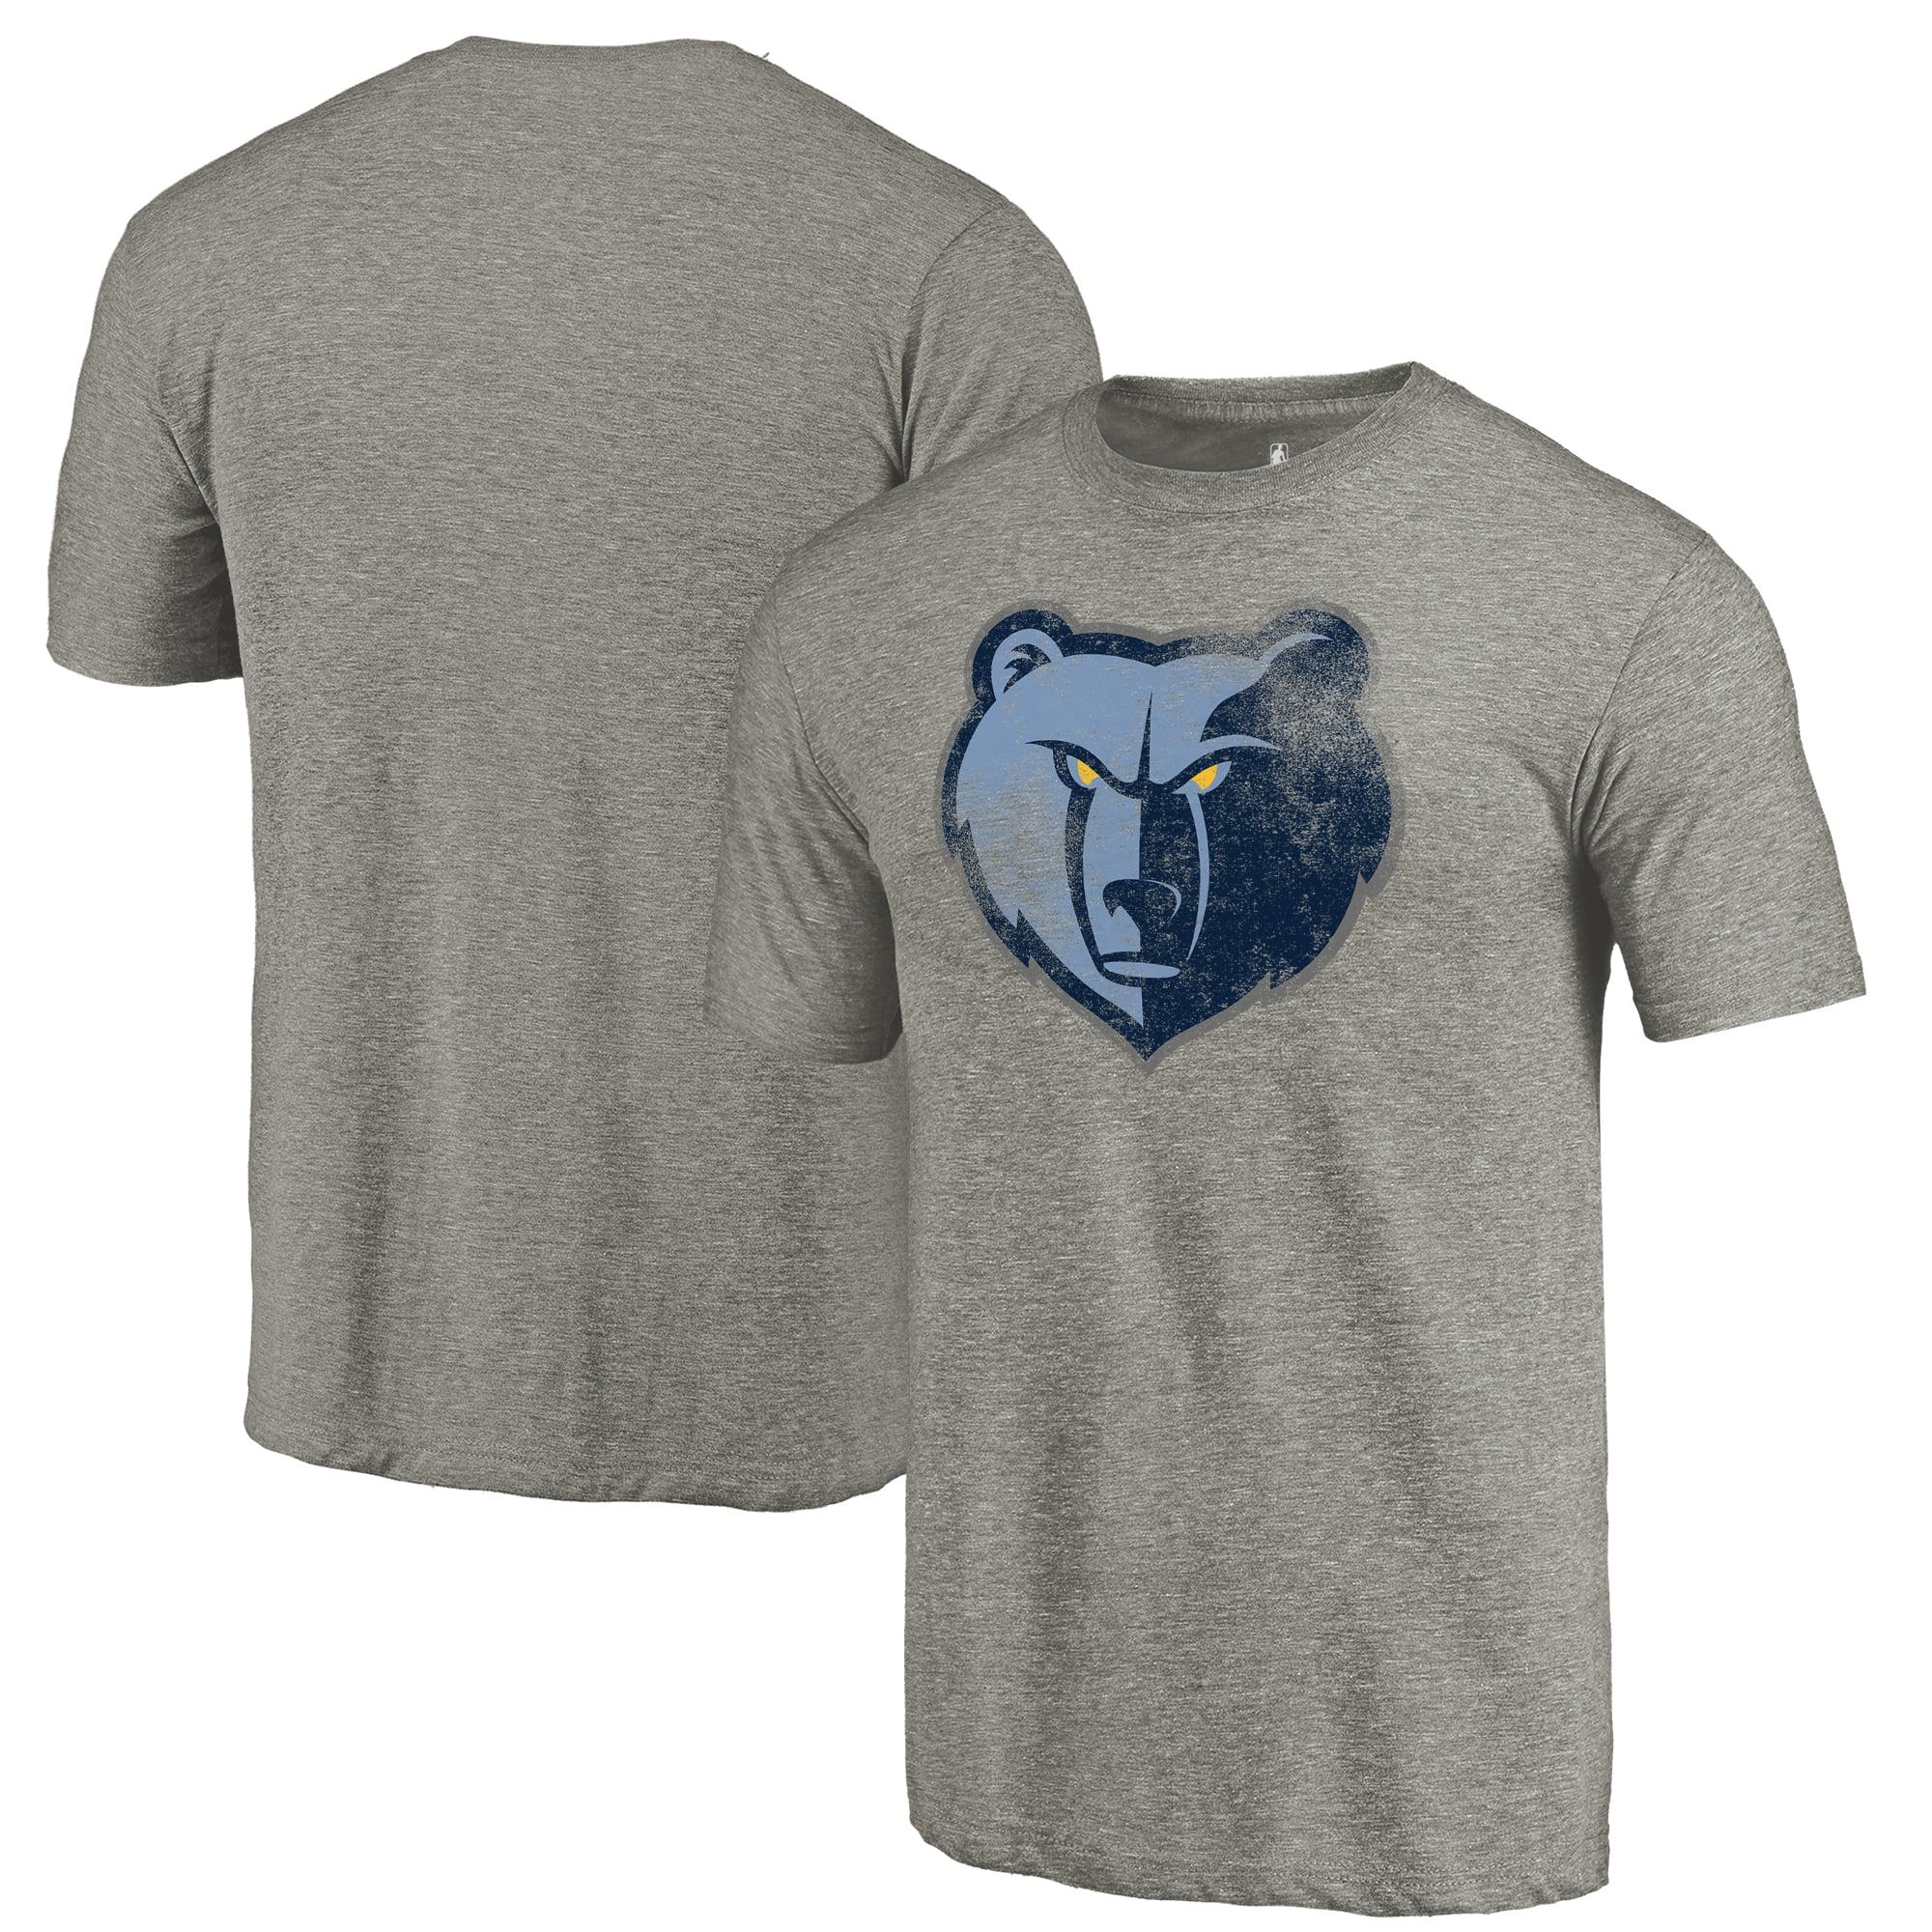 Memphis Grizzlies Fanatics Branded Distressed Team Logo Tri-Blend T-Shirt - Heather Gray